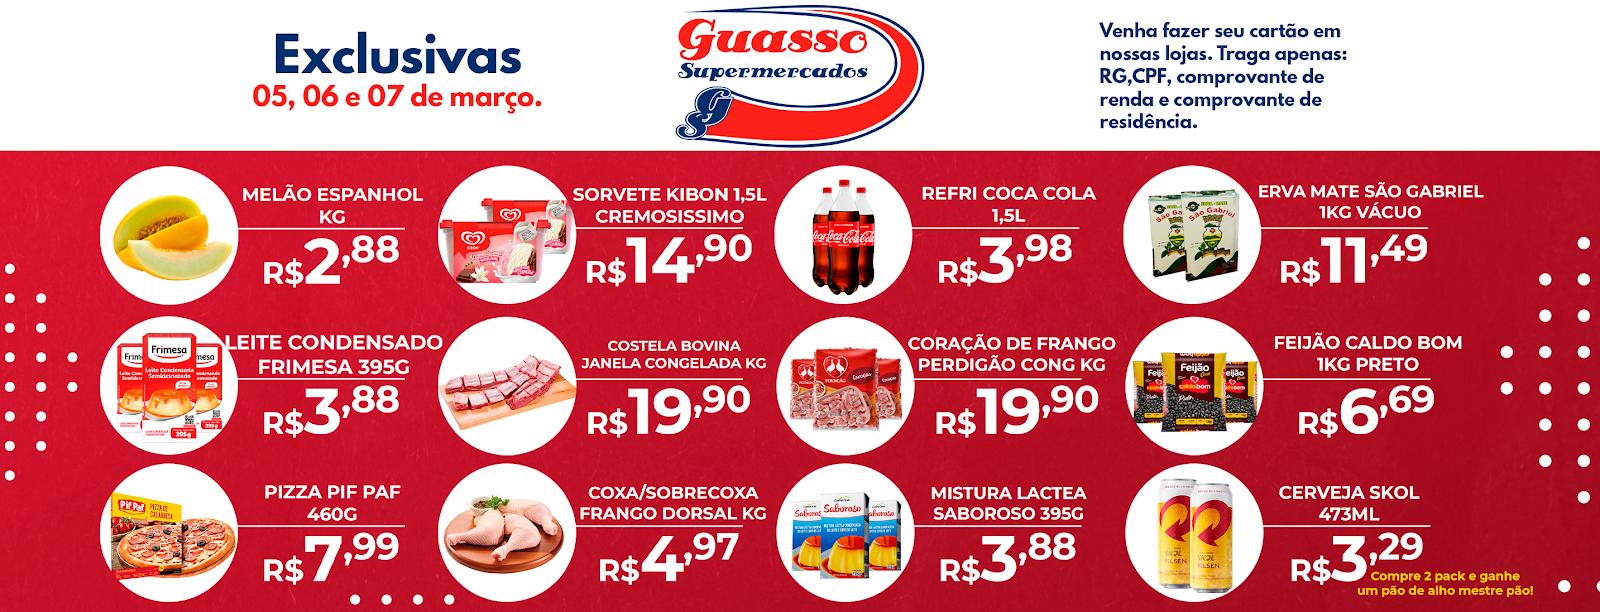 Banner Grupo Guasso